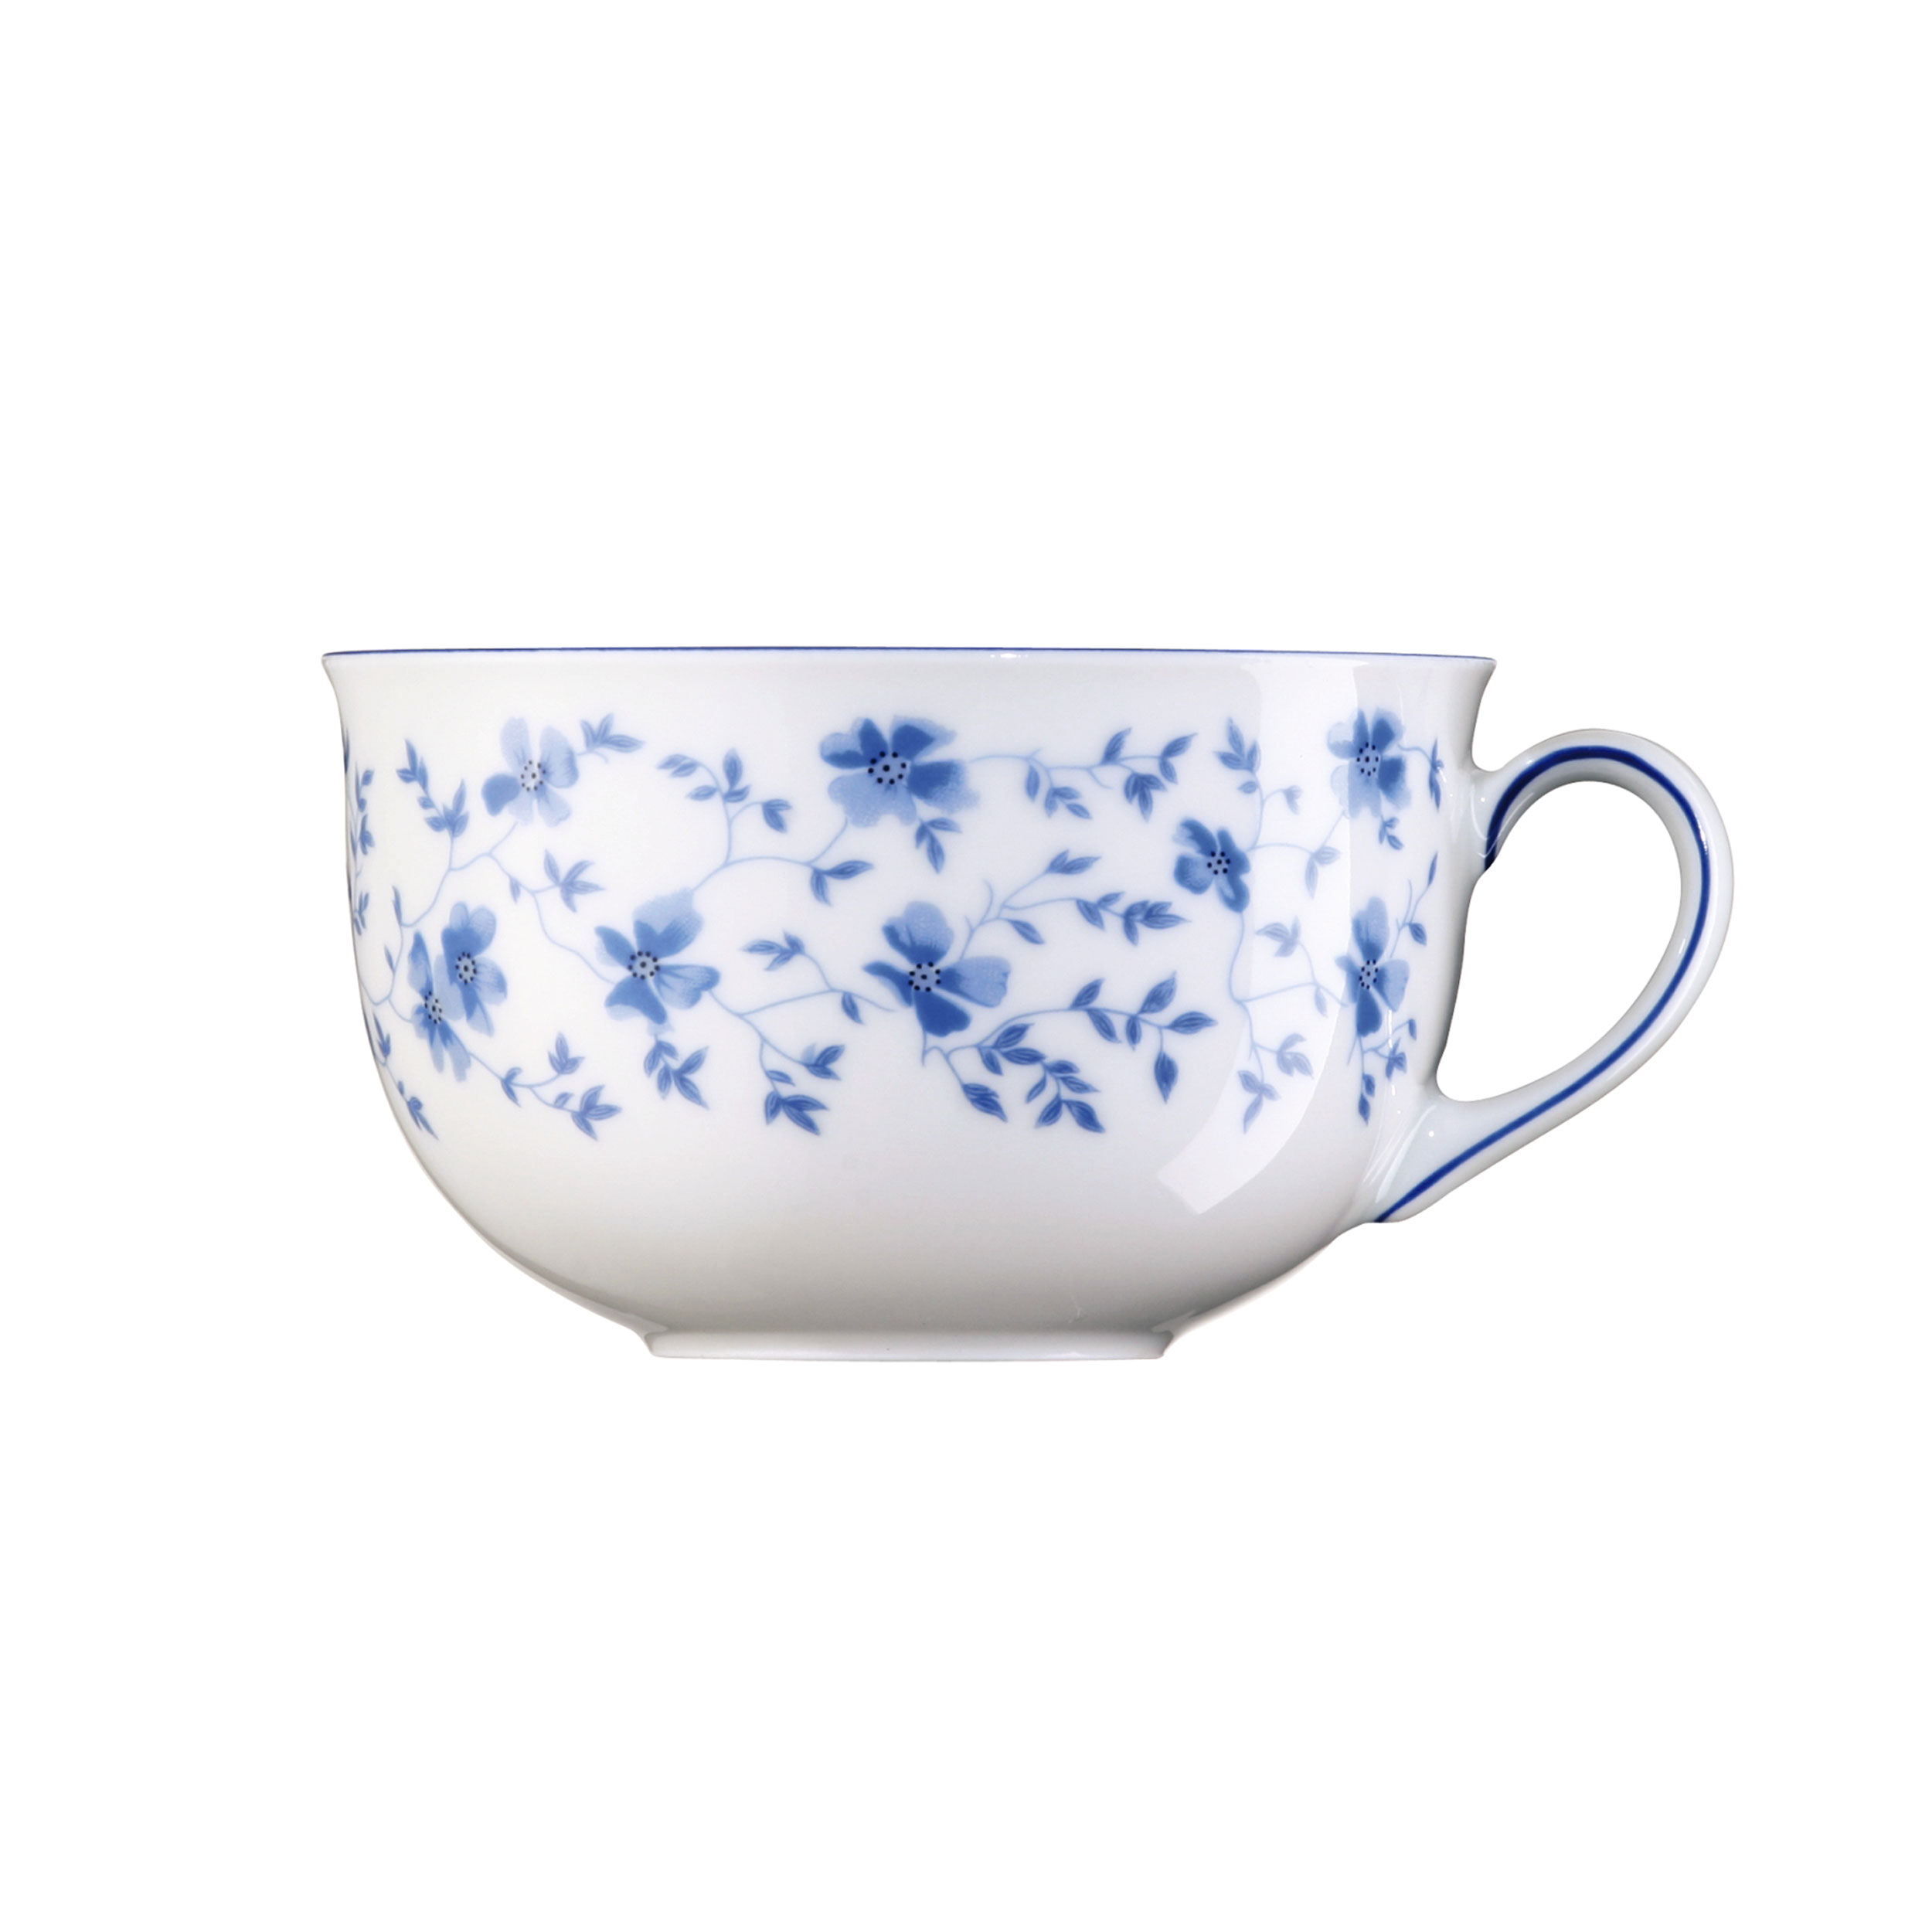 CupBreakfast Café Blue Cafe MugDrinking Arzberg 1382 Lait Coffee Form FlowersPorcelain300 Ml Au CxBdoe